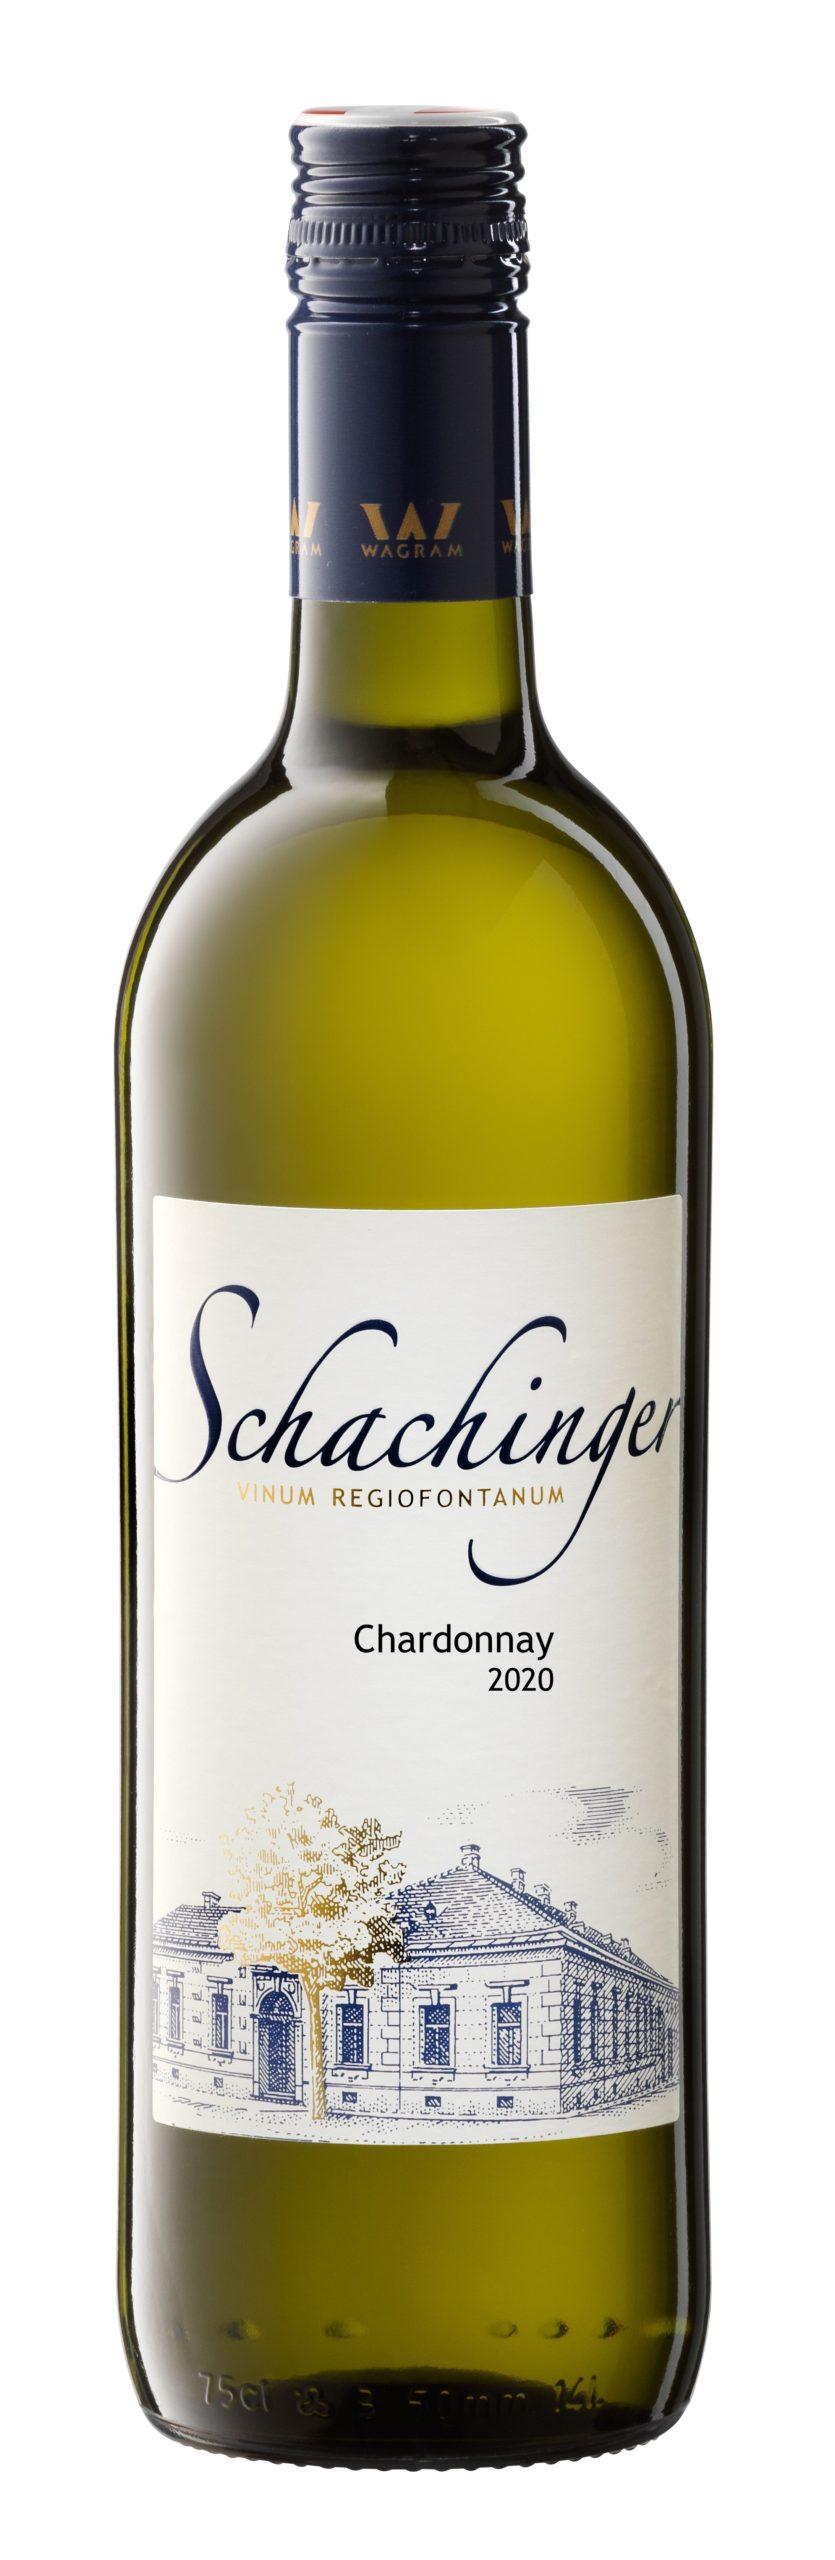 Chardonnay 2020 Weingut Schachinger Königsbrunn am Wagram